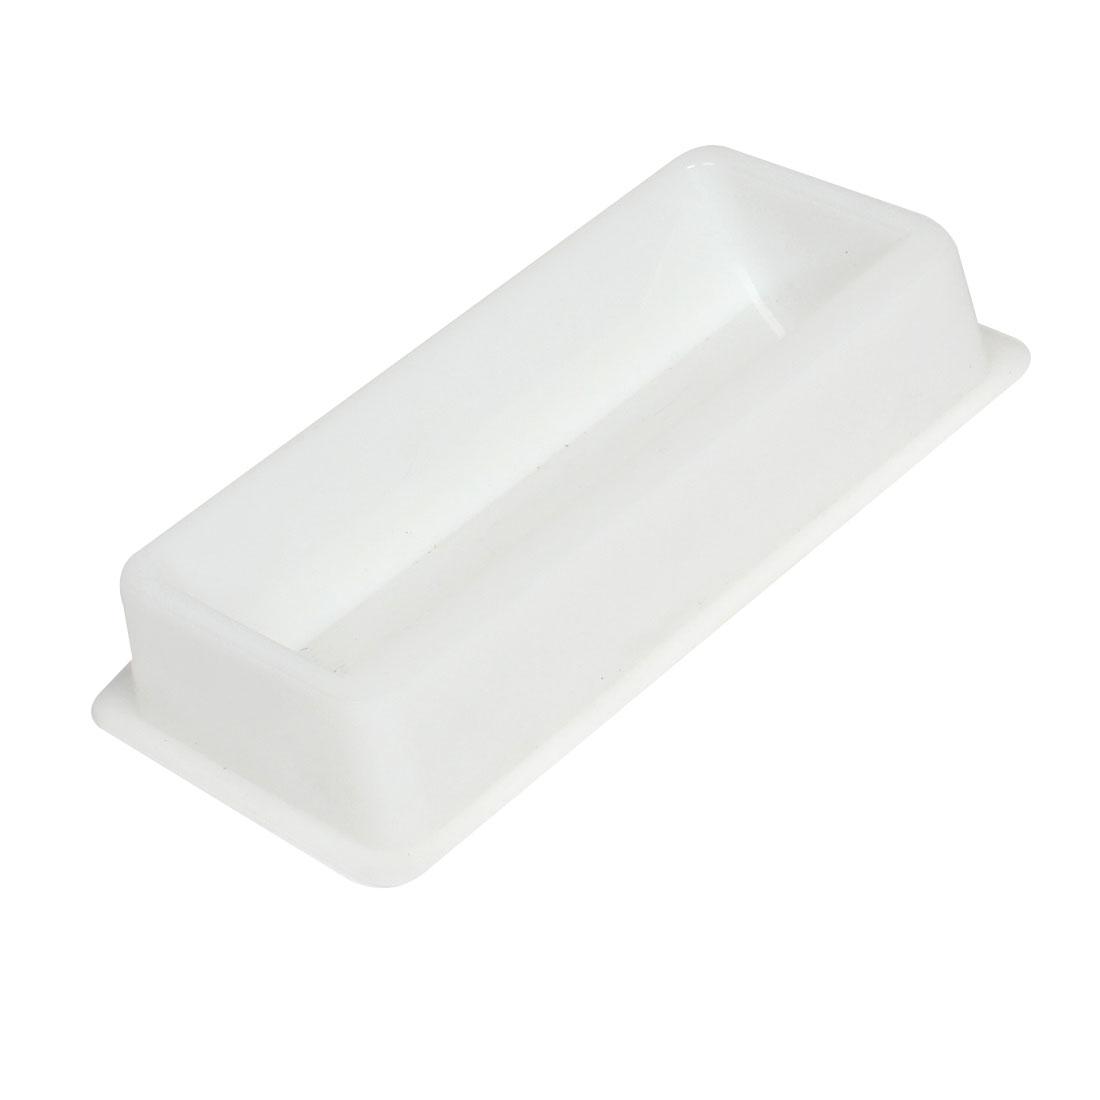 50mL Capacity White Plastic Liquid Transfer Trough for Lab